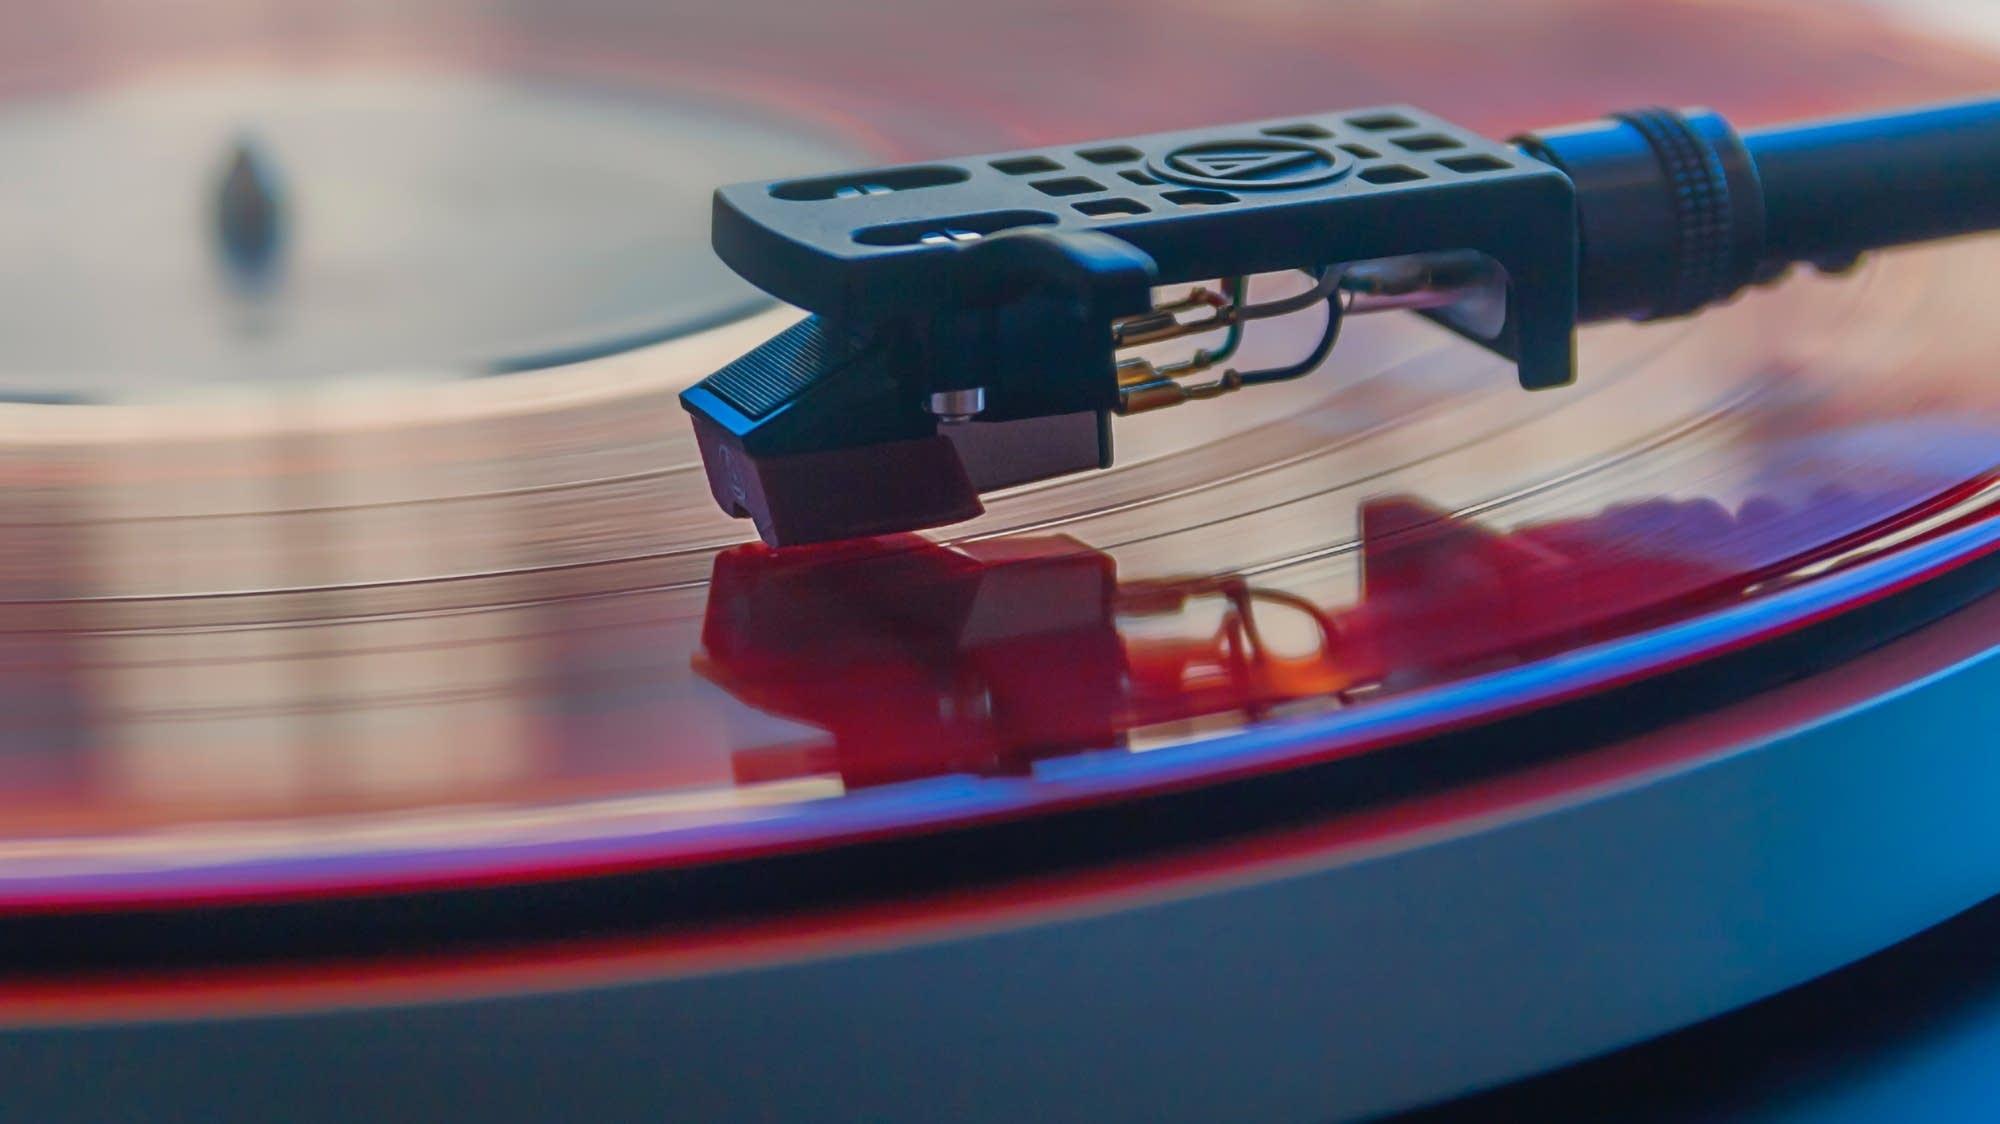 A vinyl record plays